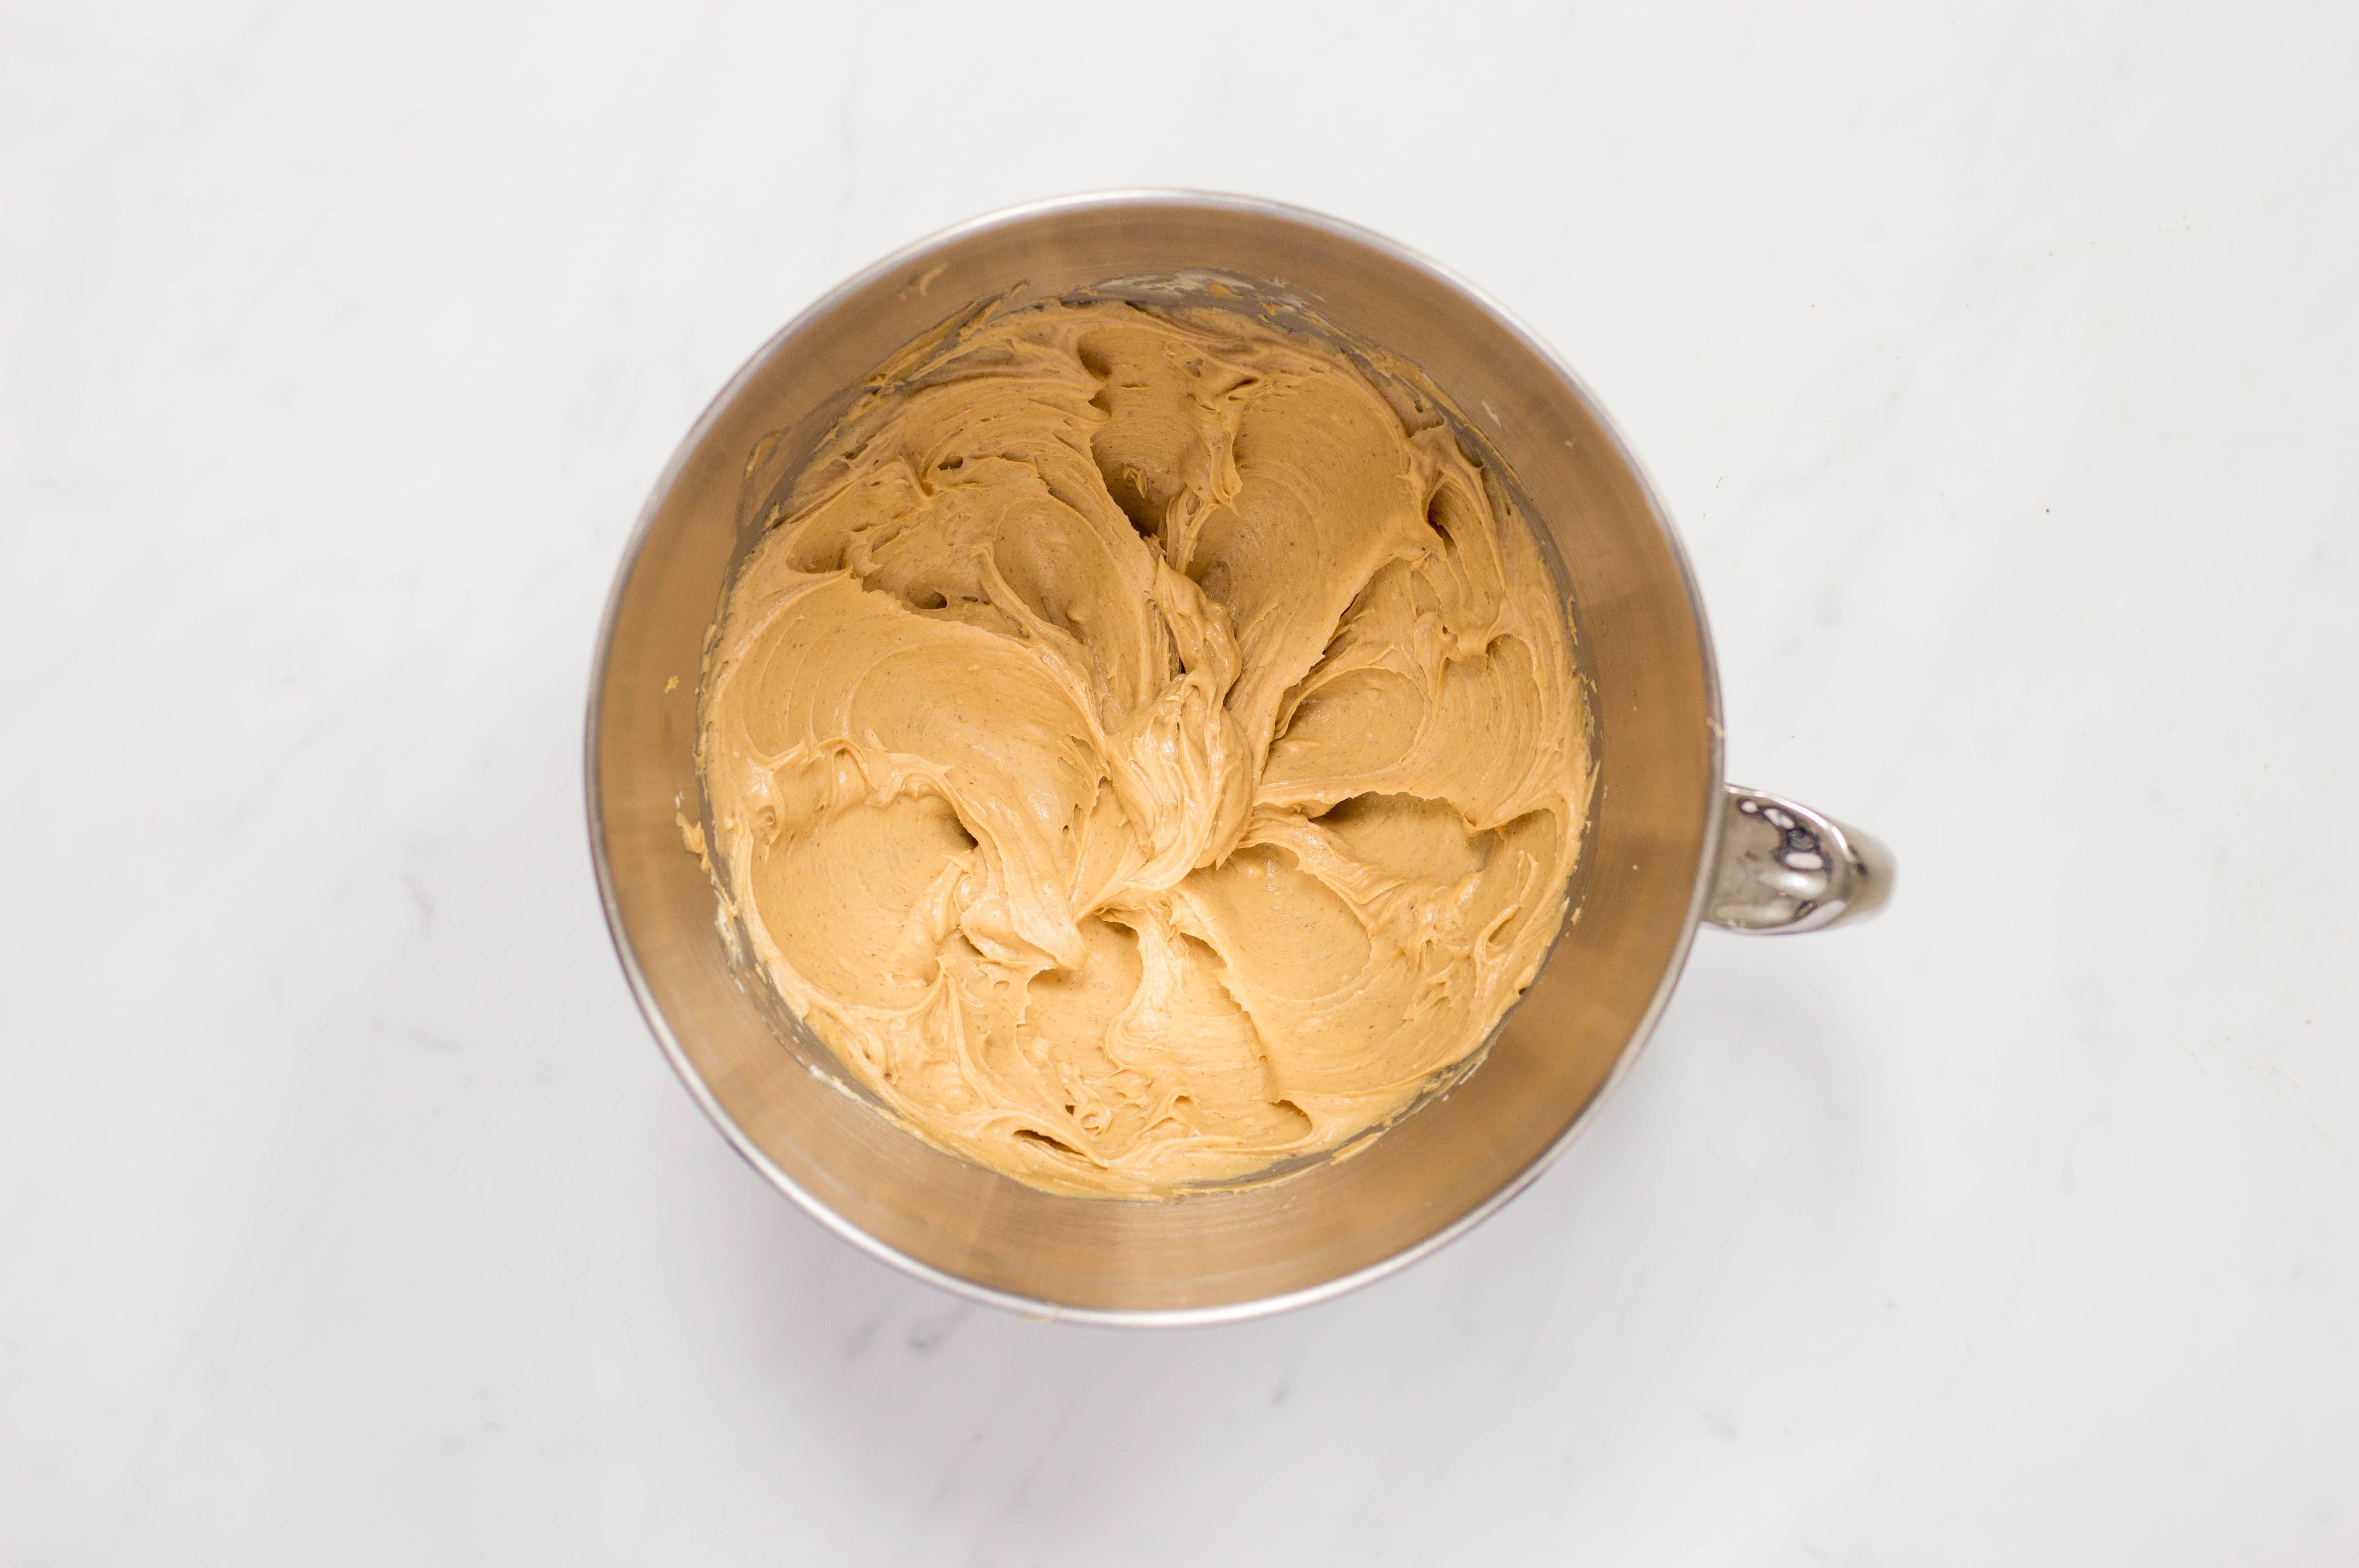 Peanut Butter frosting recipe